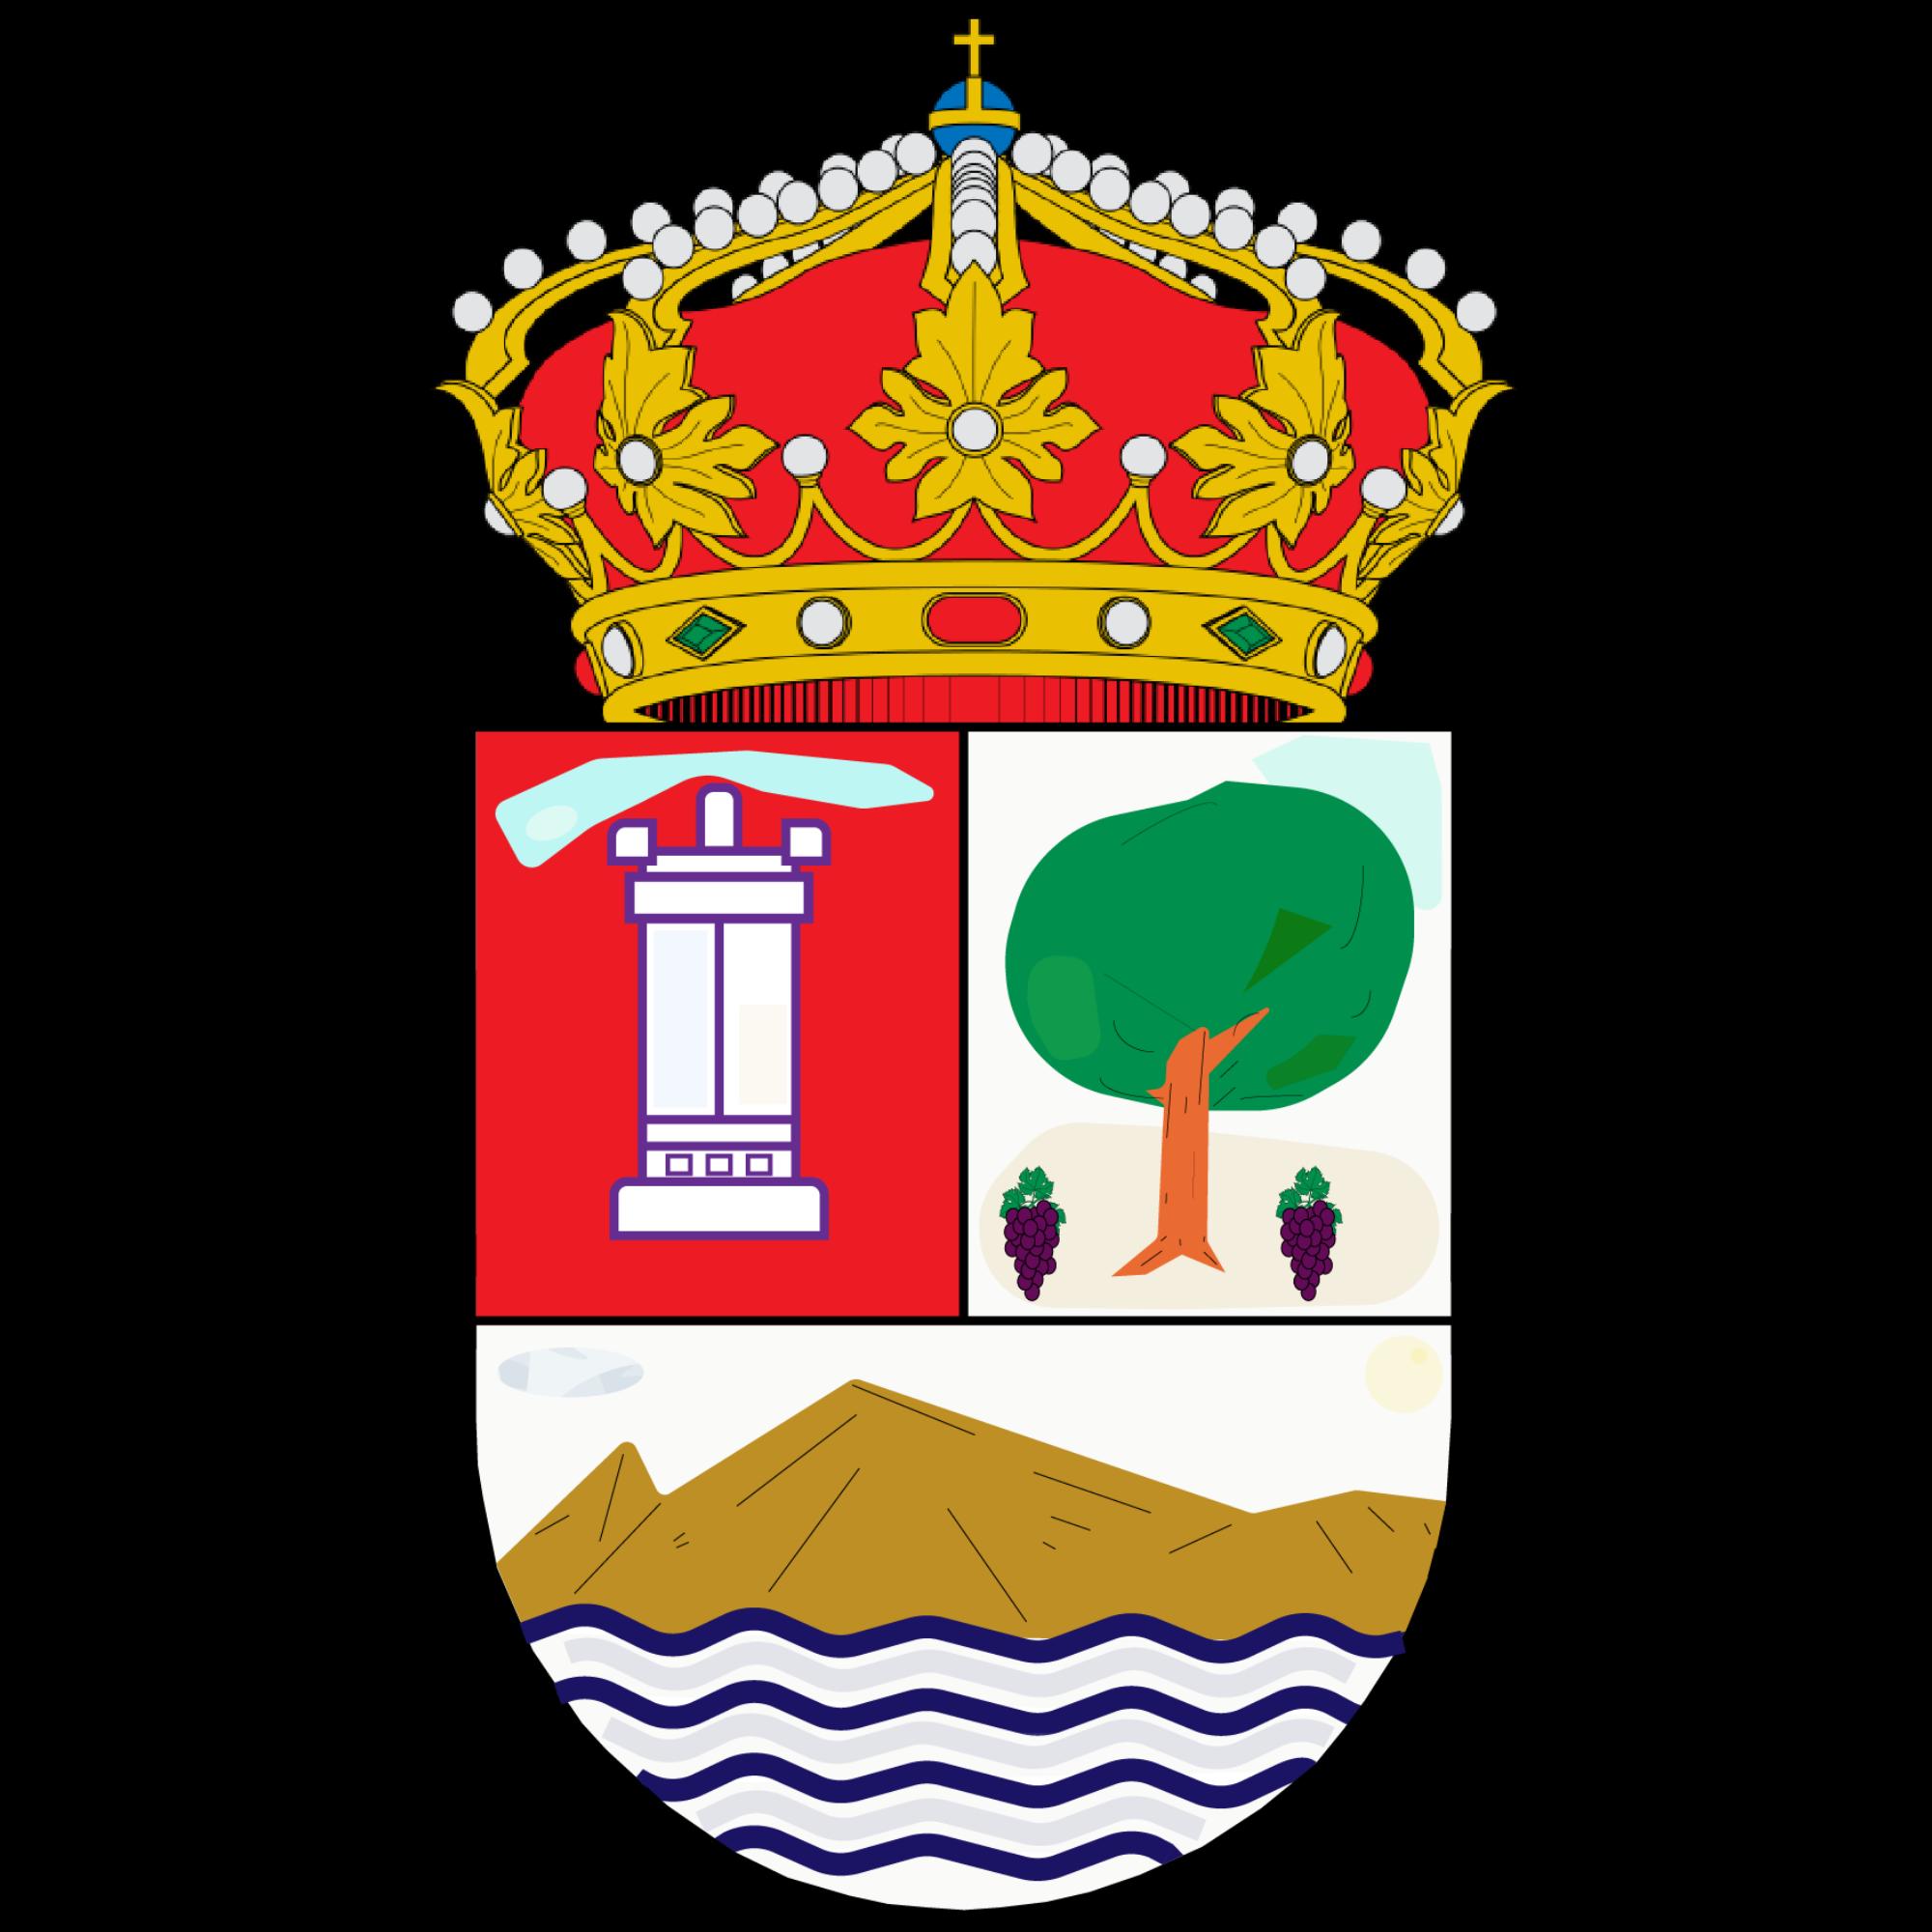 File:Escudo de Rubiá Ourense.svg.